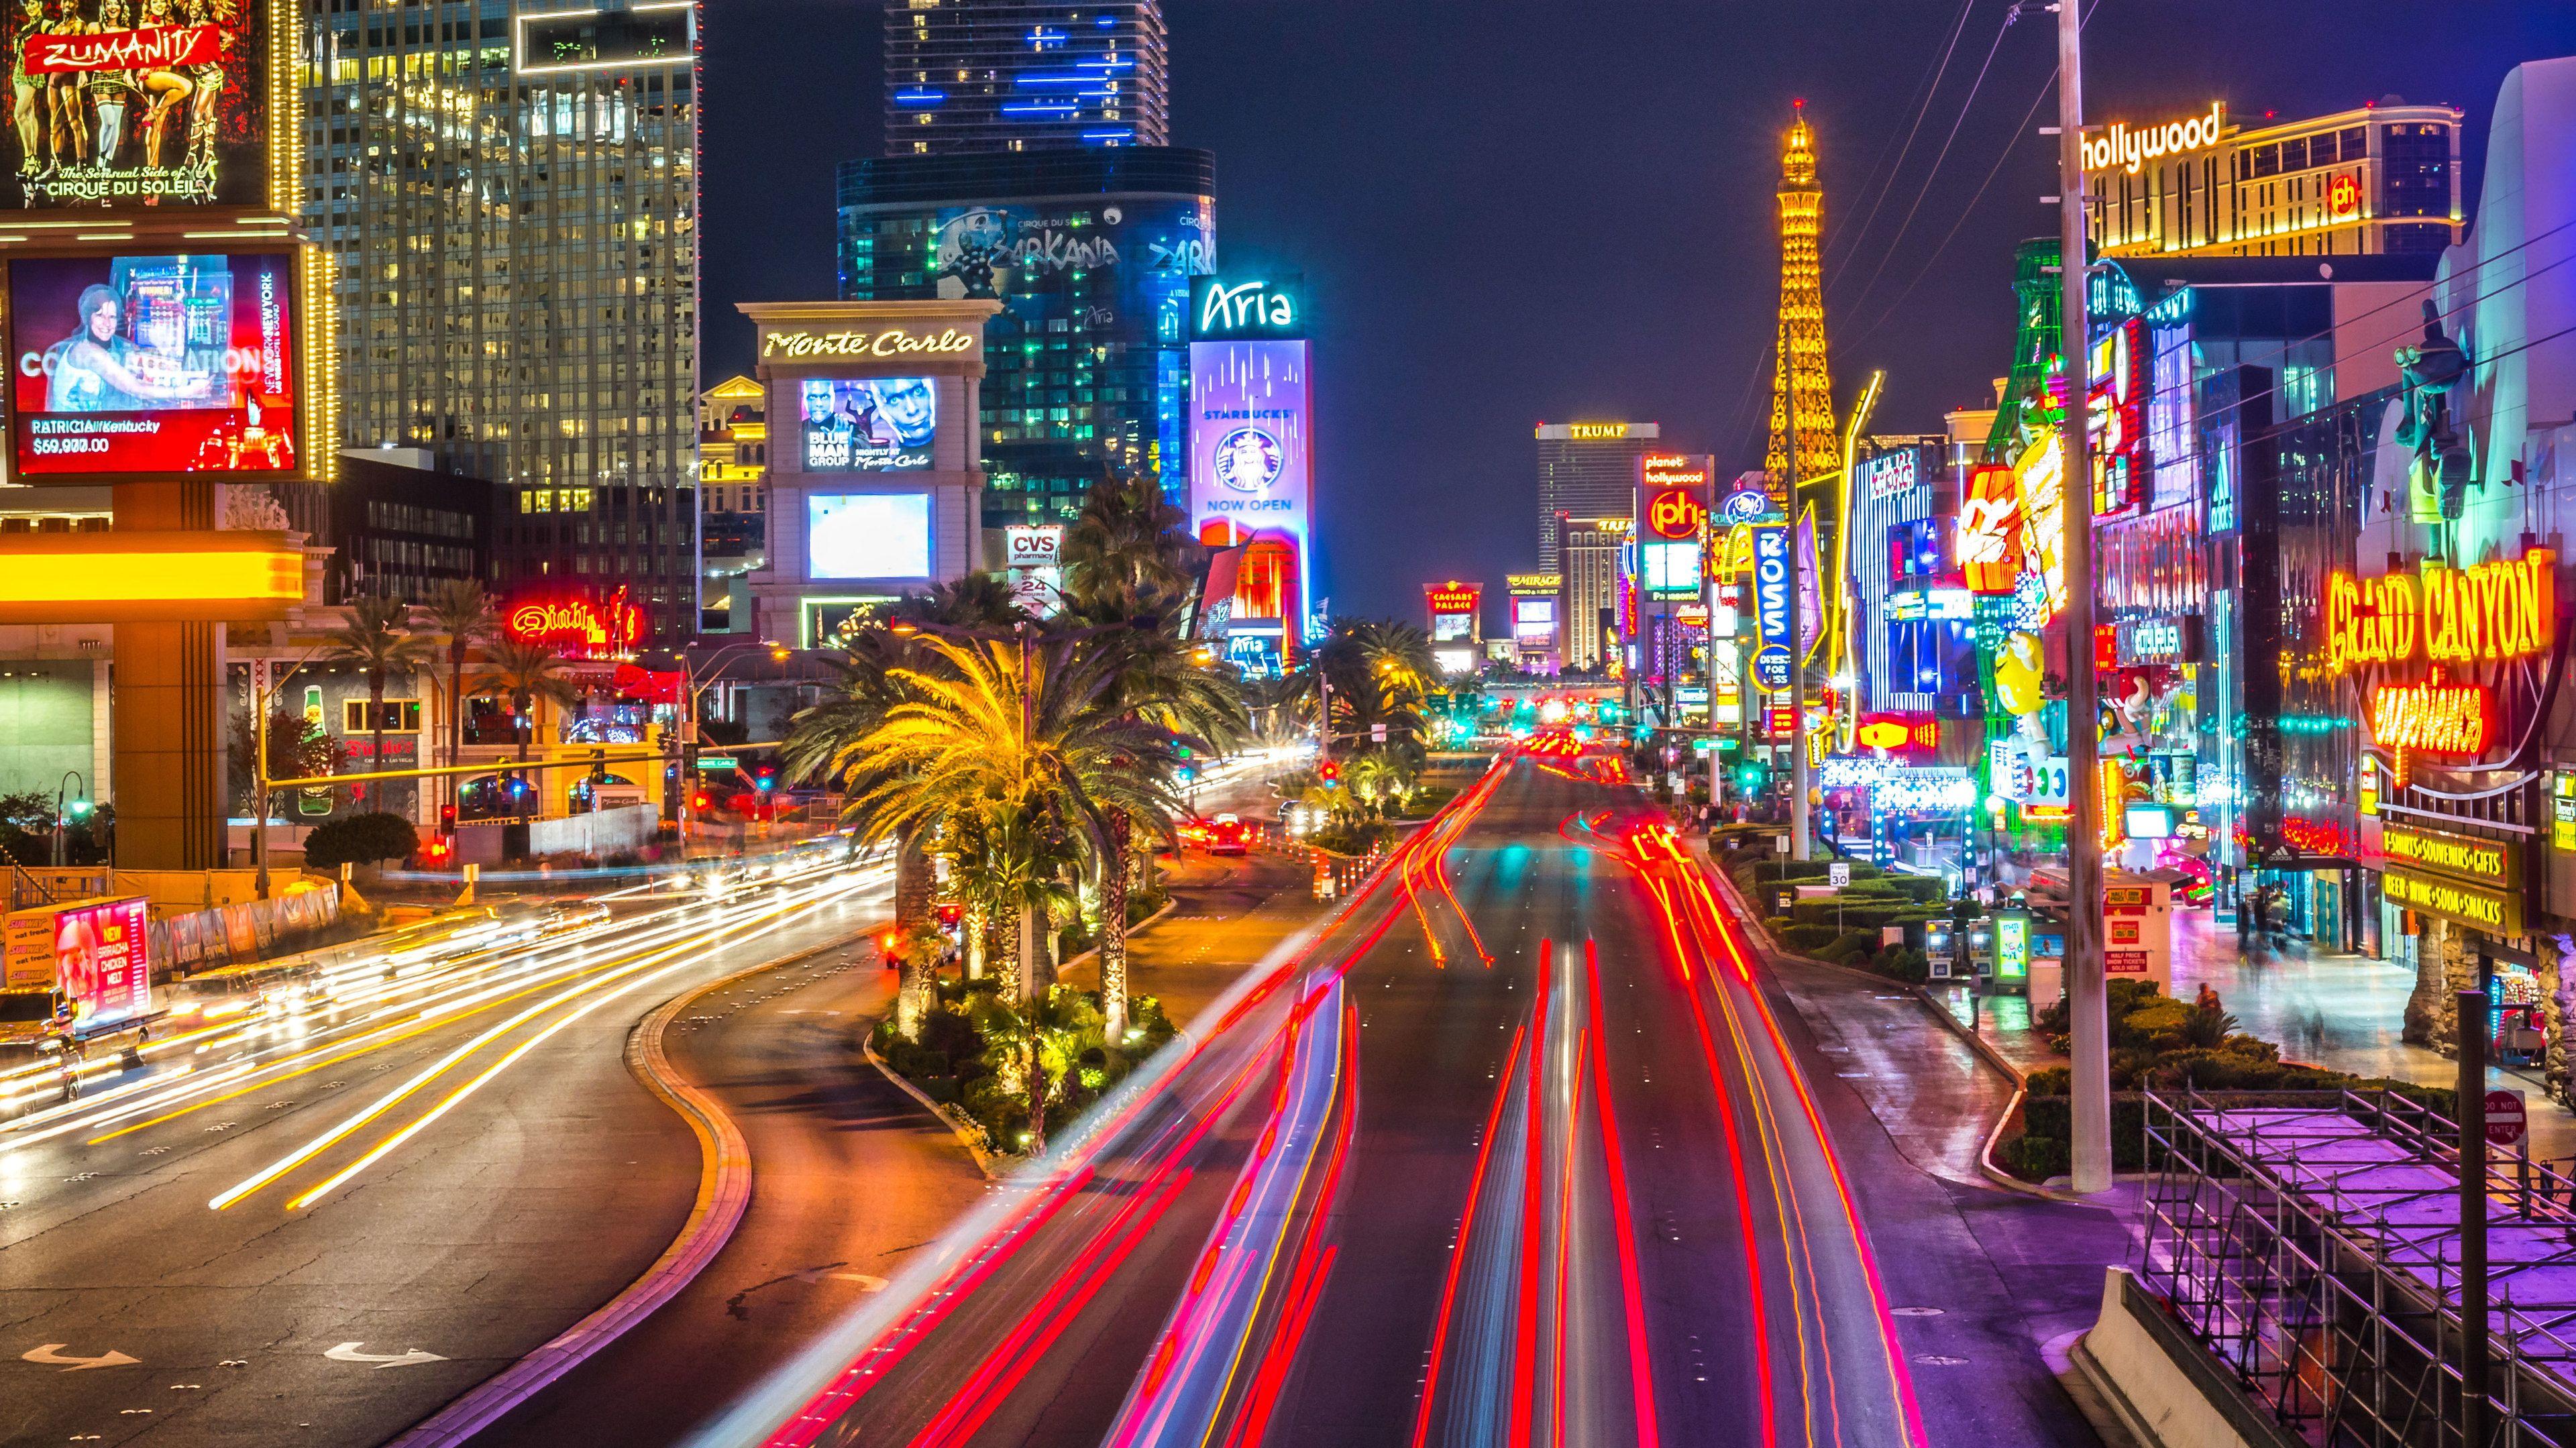 Timelapse of The Las Vegas strip